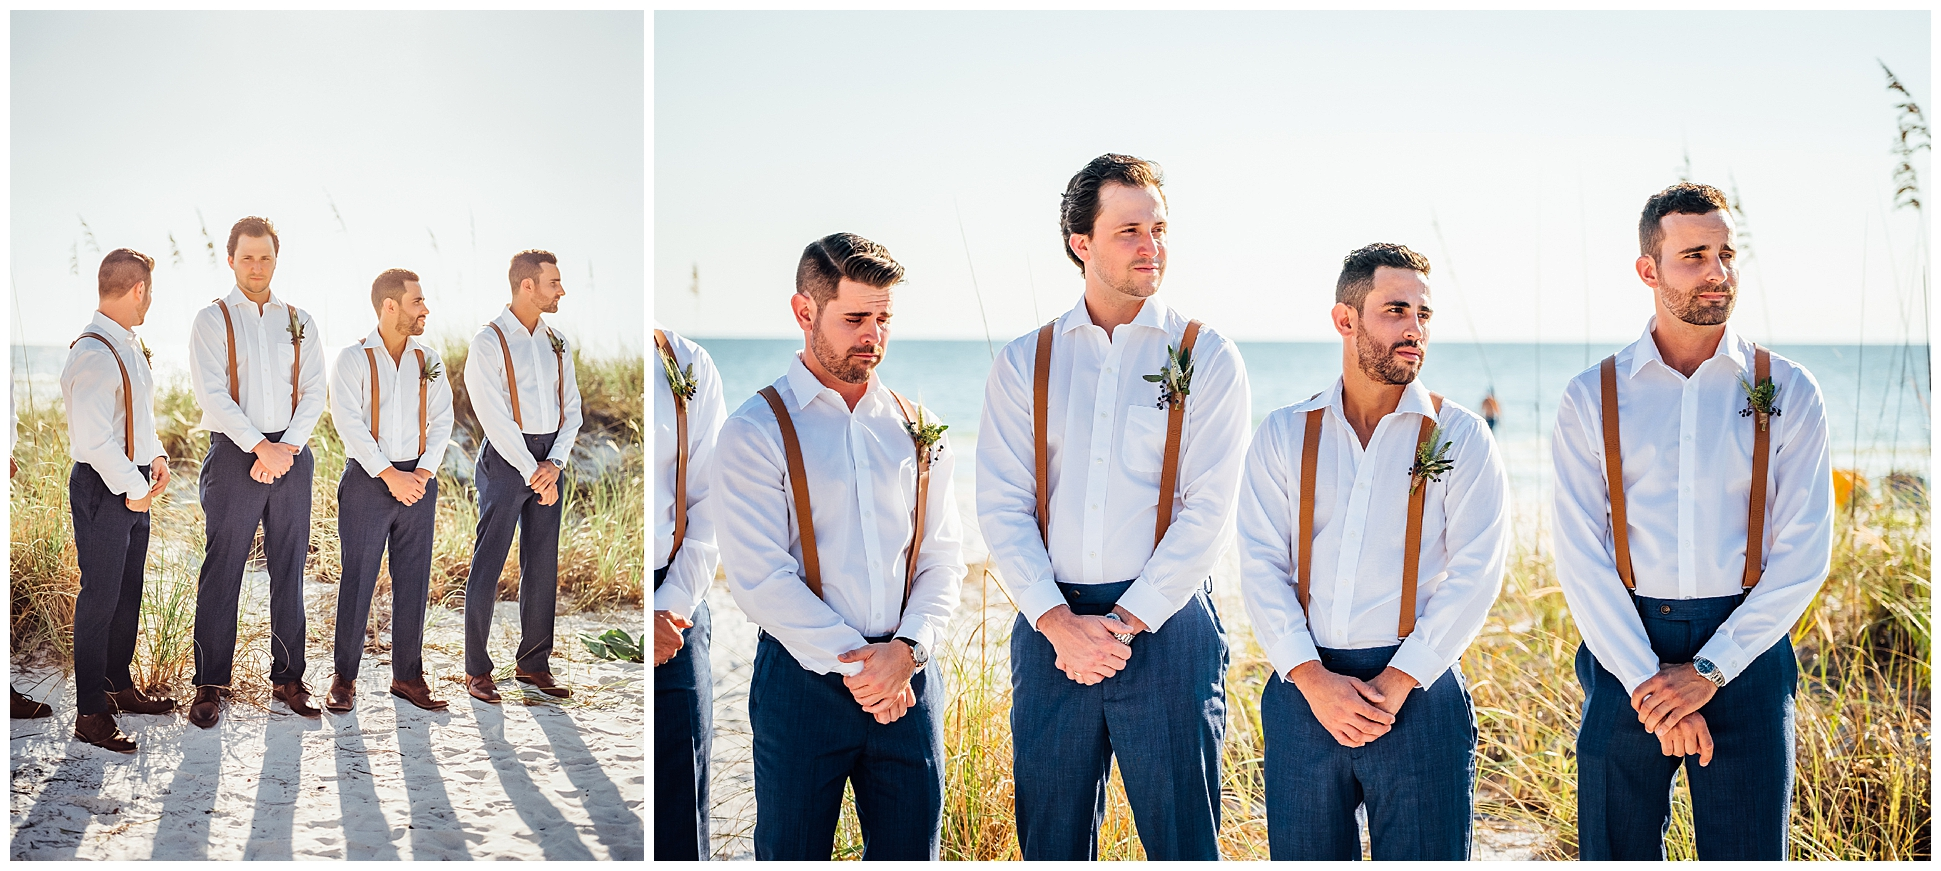 medium-format-film-vs-digital-wedding-photography-florida-beach_0011.jpg